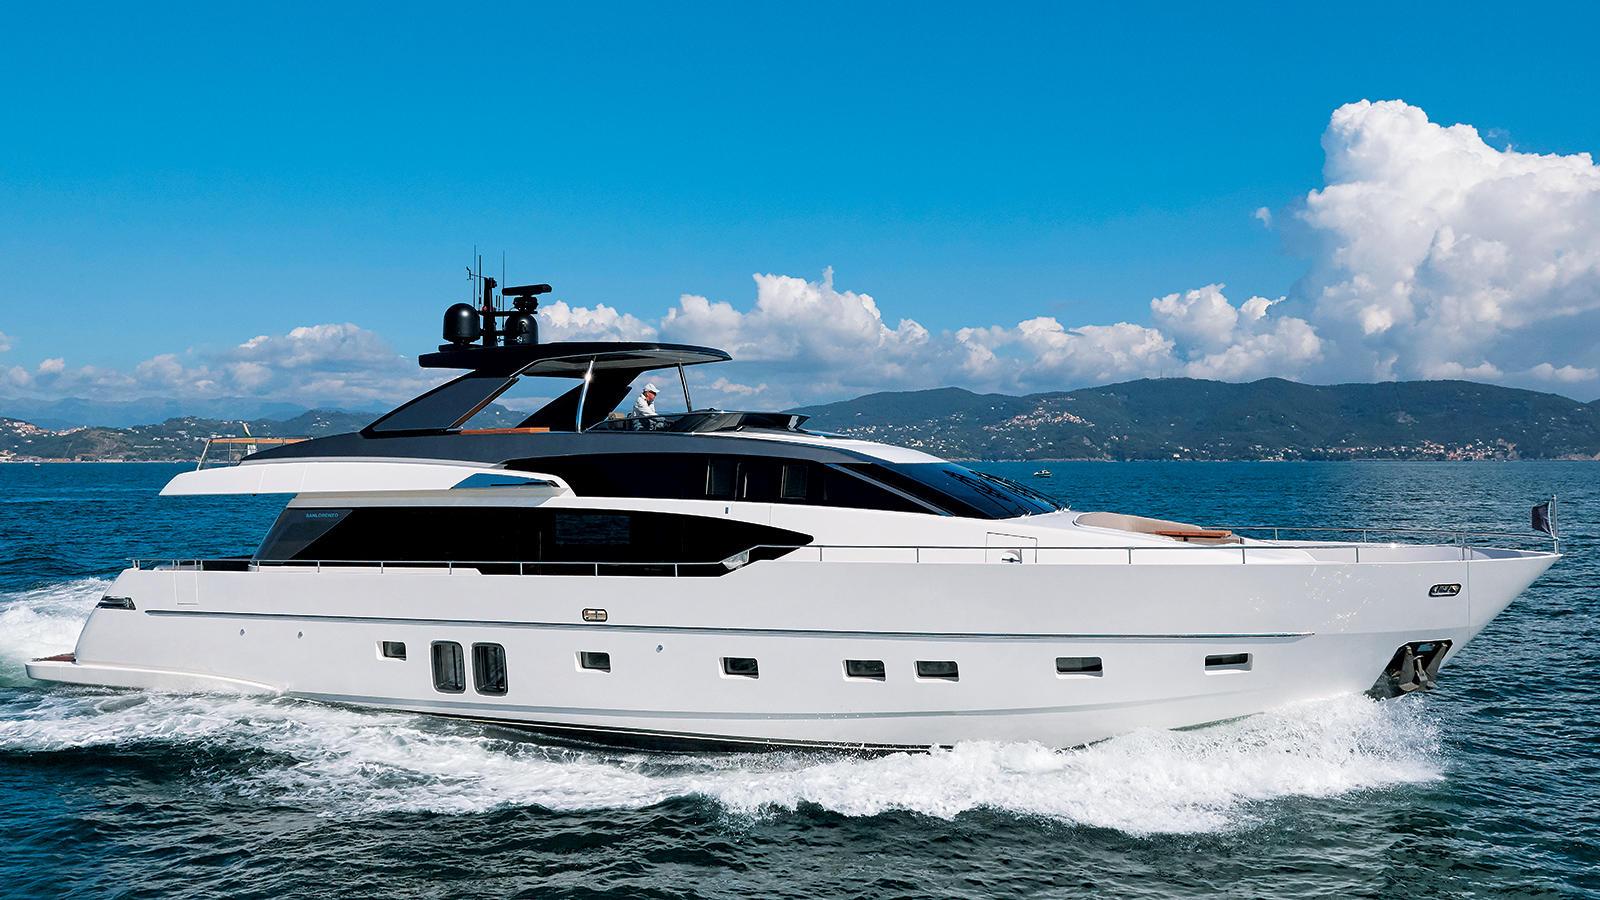 Sanlorenzo Motor Yacht Sevenstar Sold